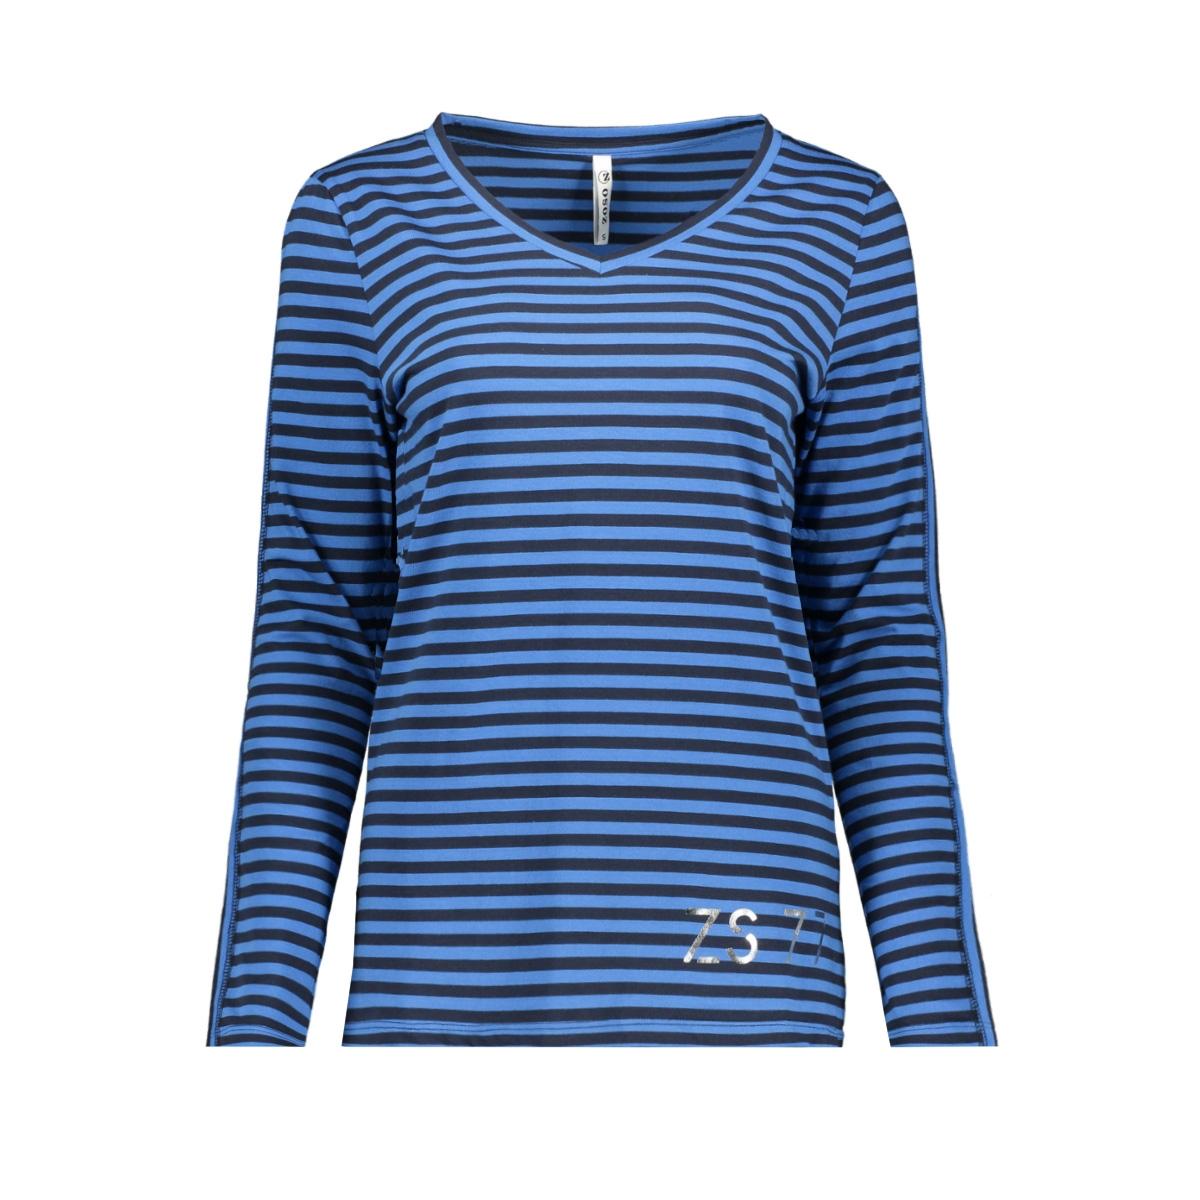 alida striped shirt 194 zoso t-shirt navy/blue